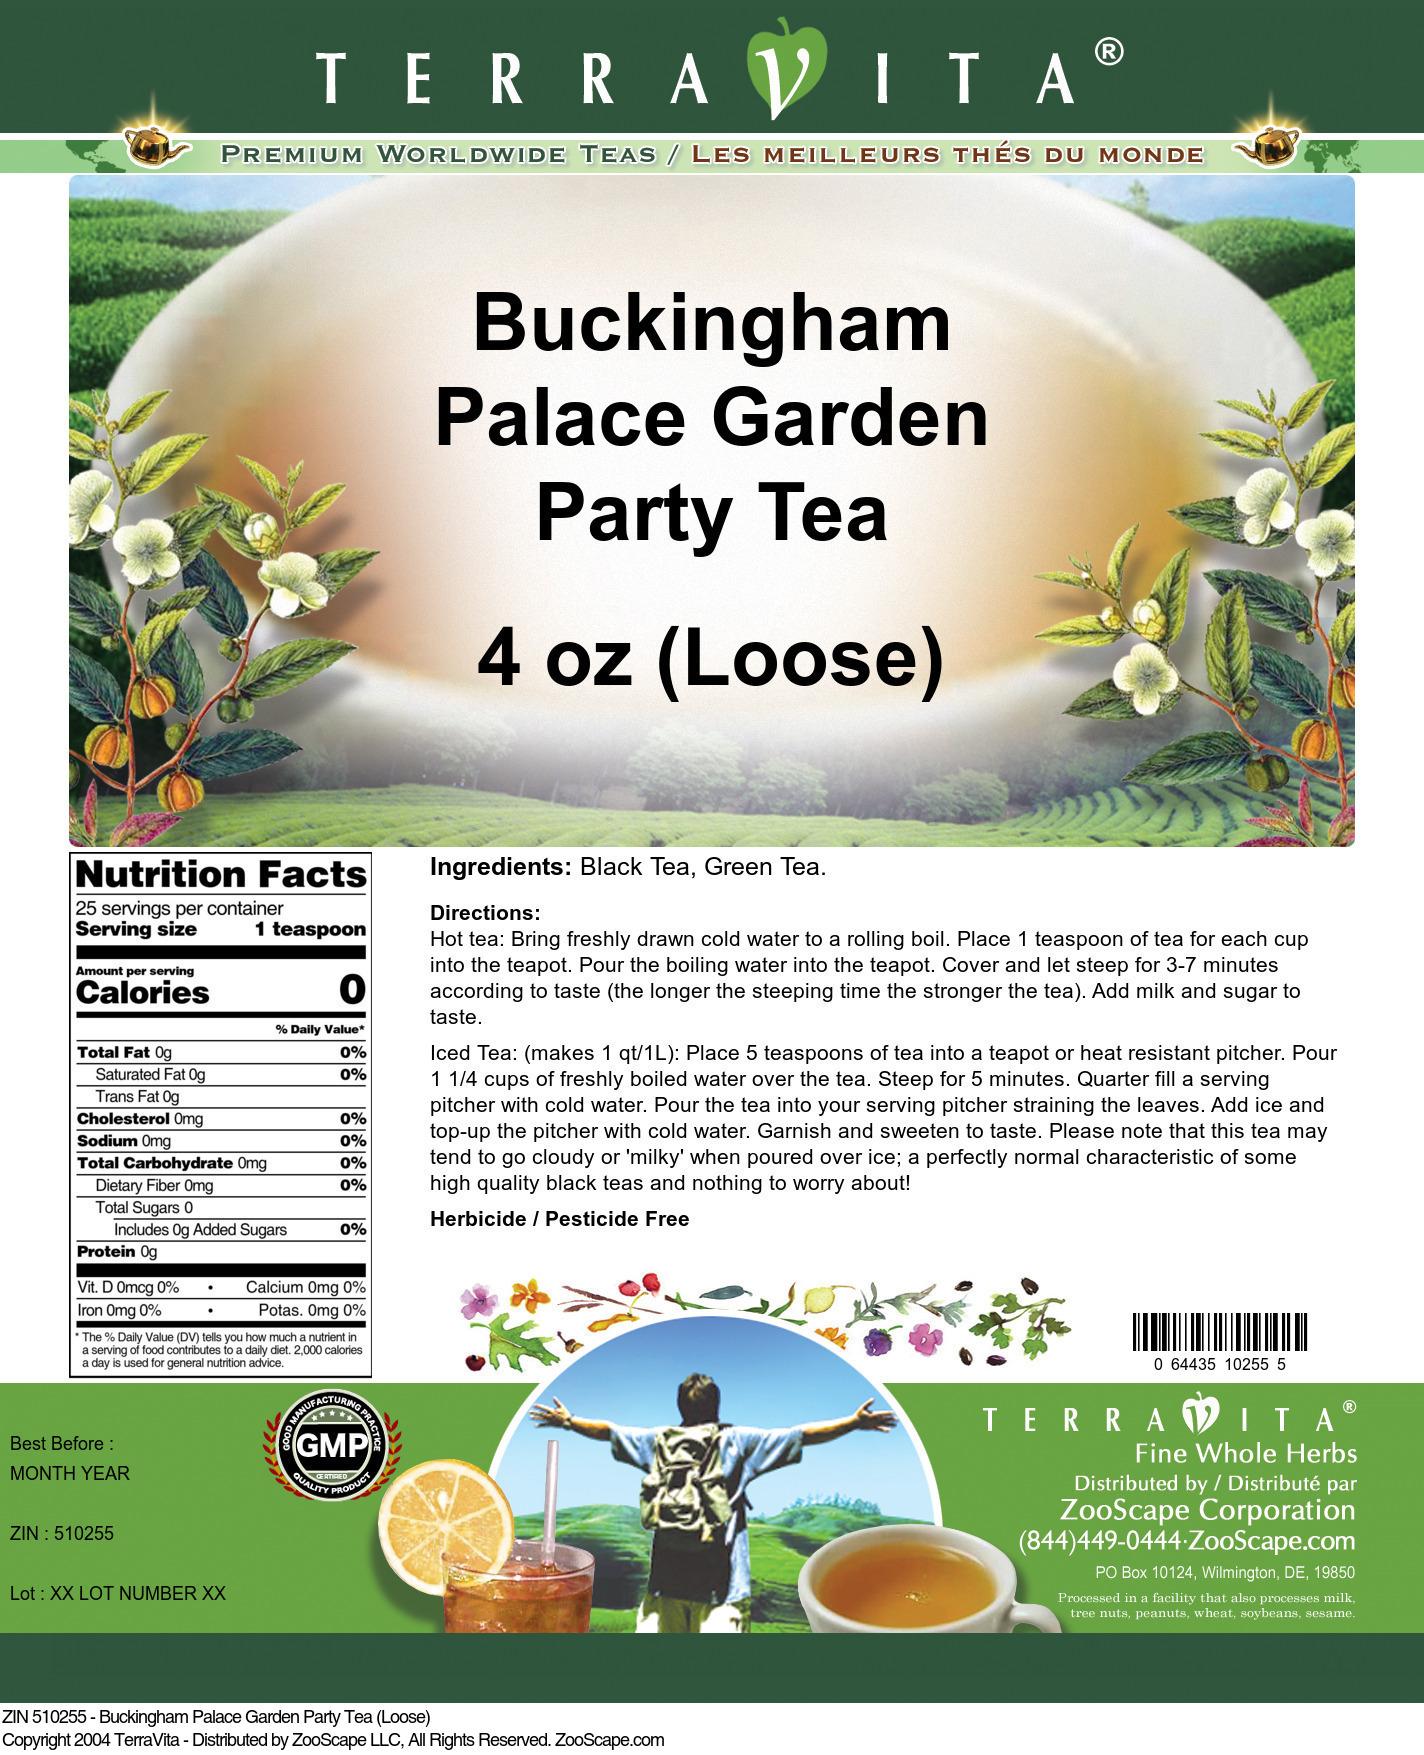 Buckingham Palace Garden Party Tea (Loose)